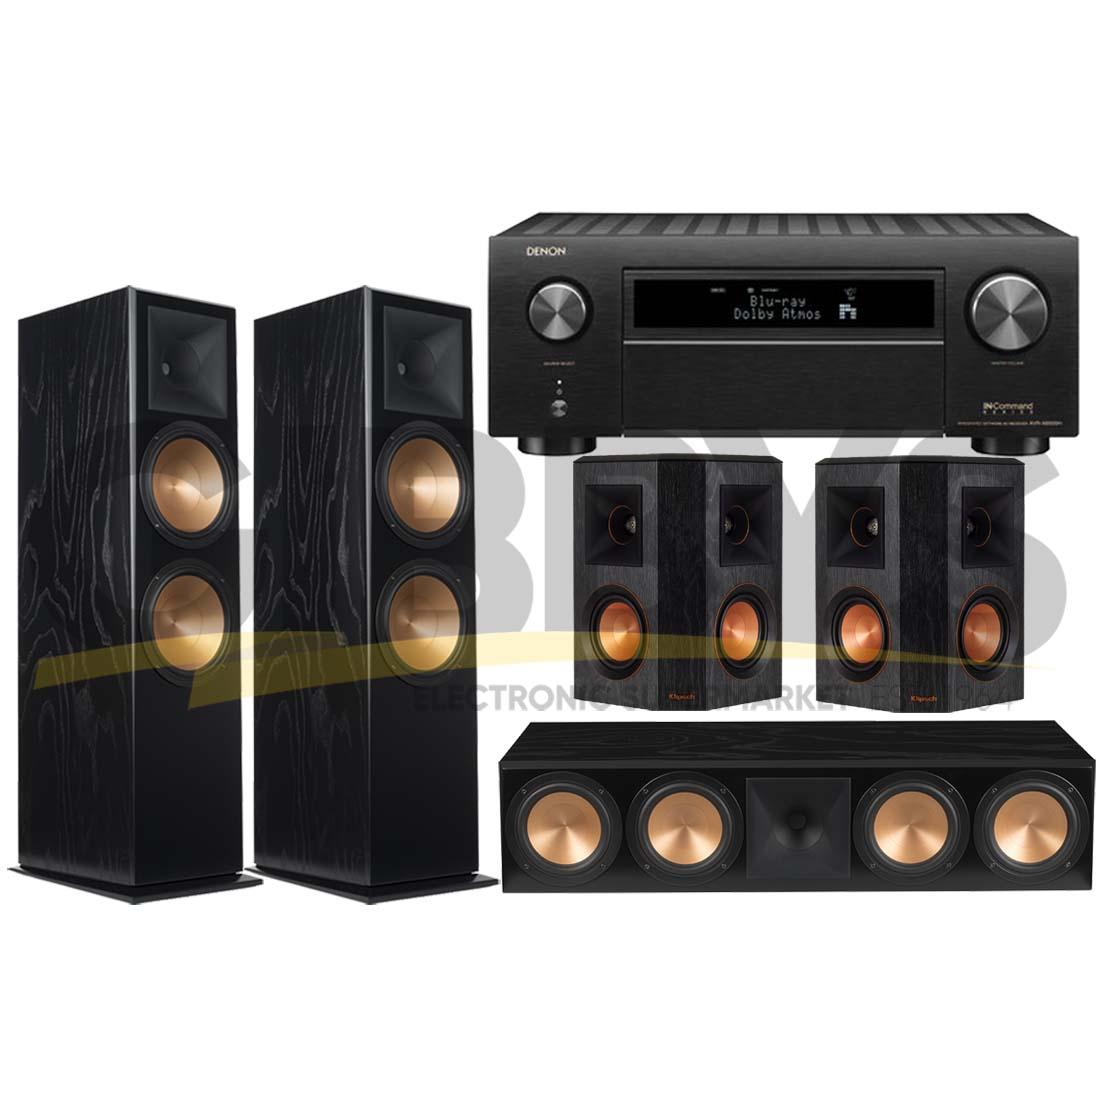 Denon AVR-X4500H